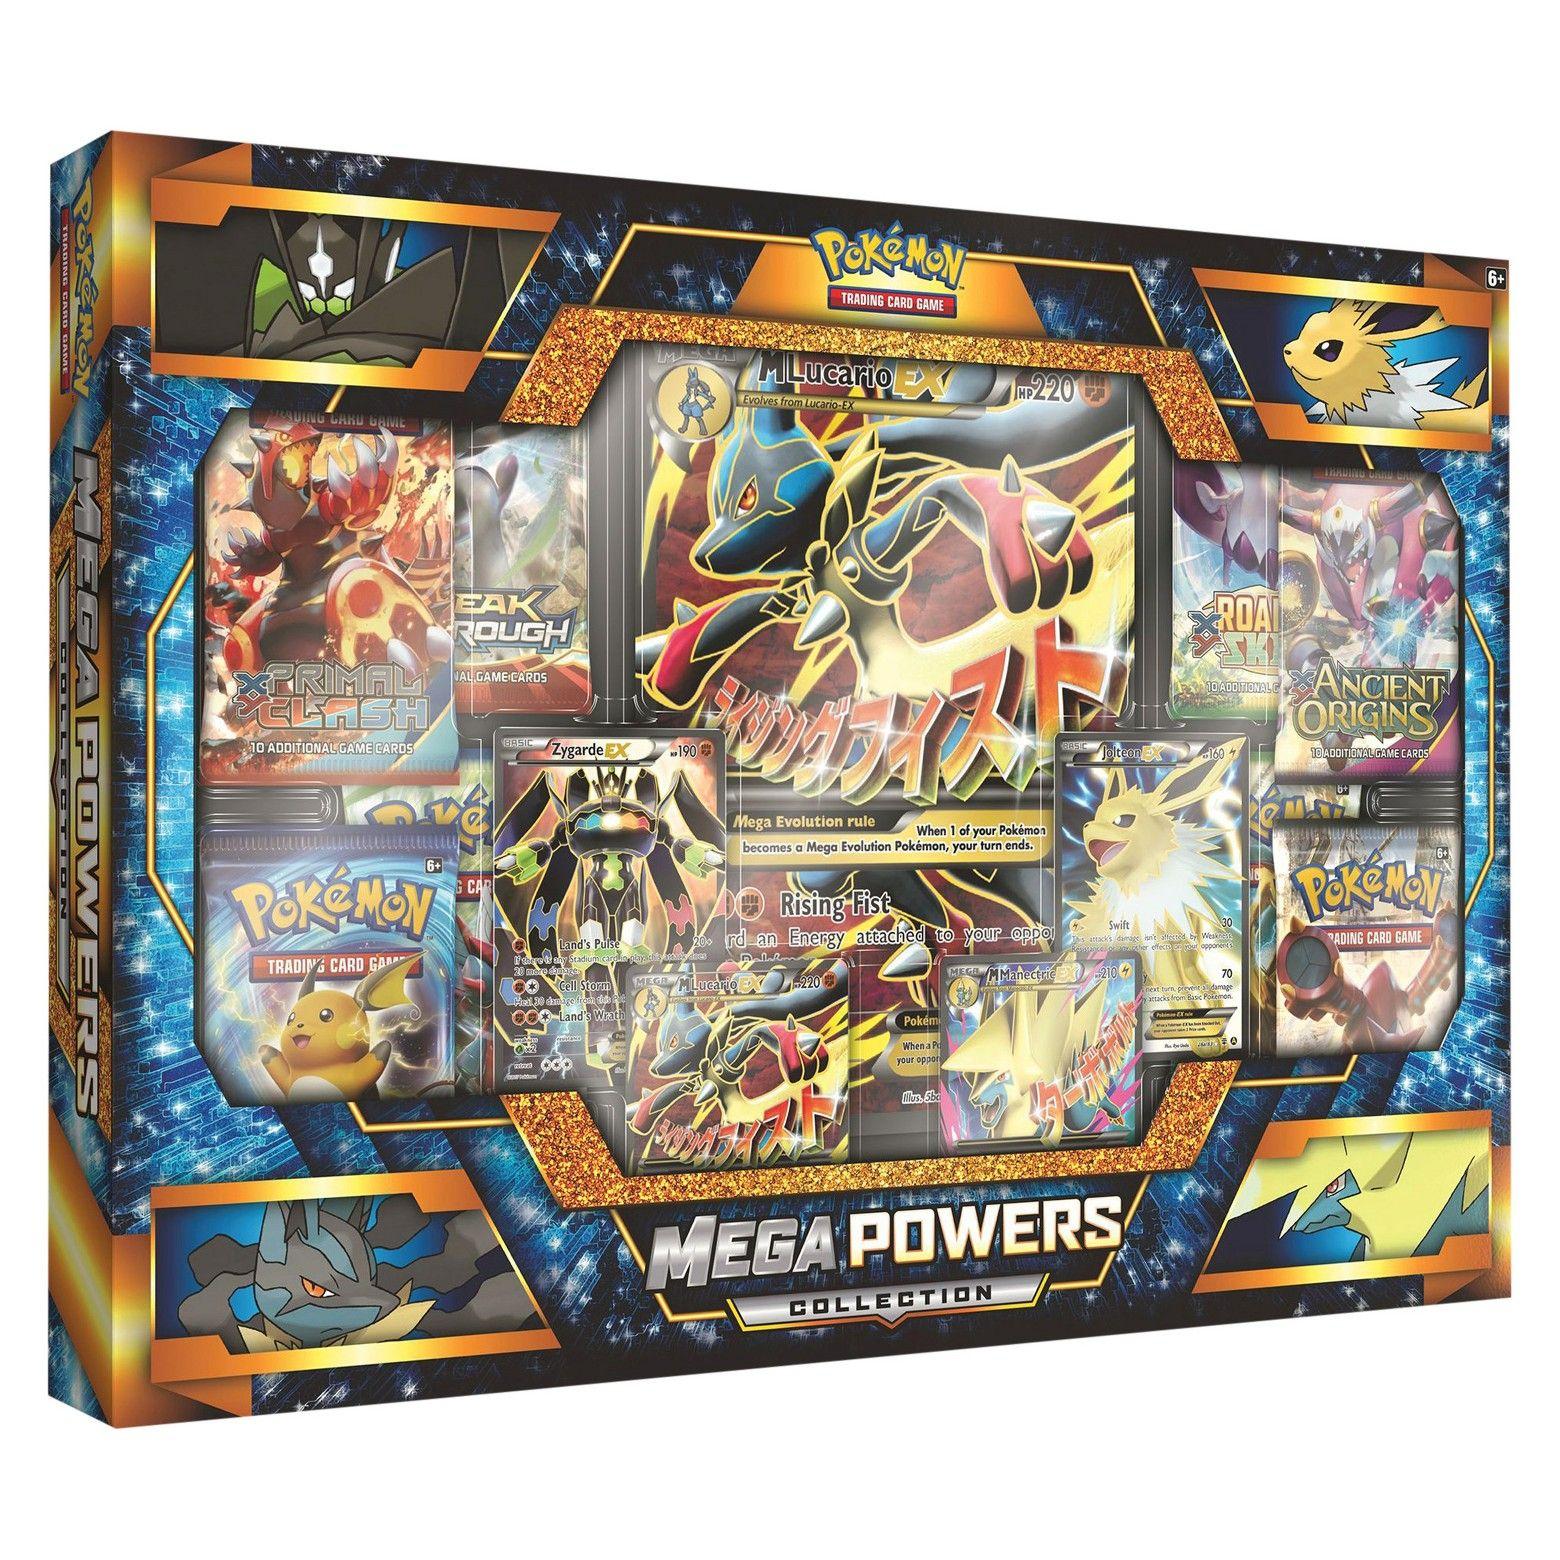 2017 Pokemon Trading Cards Mega Powers EX Box